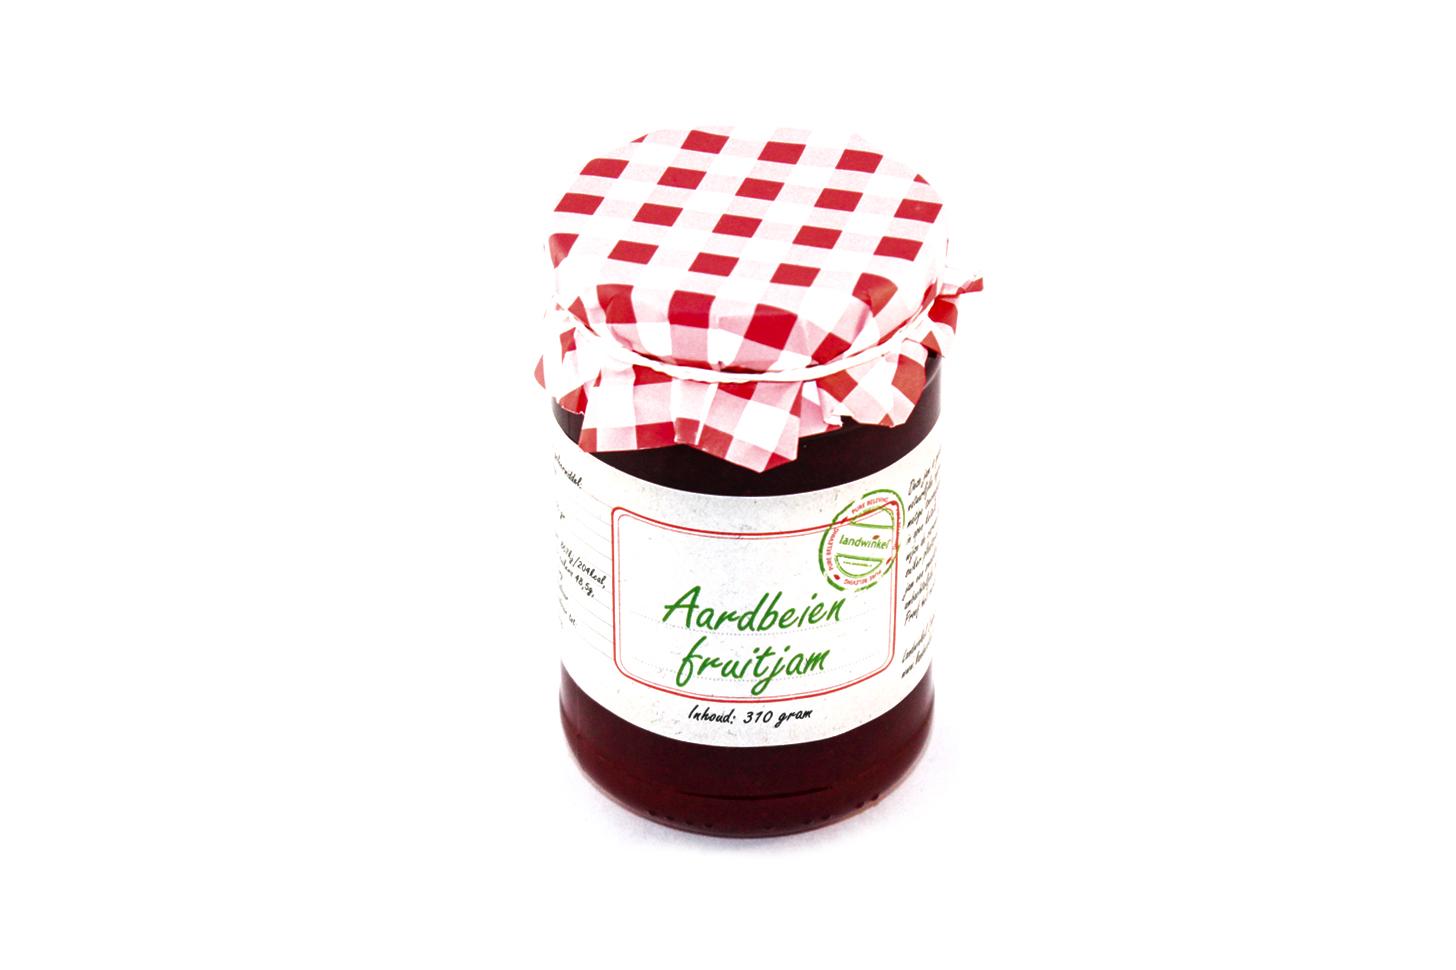 Aardbeien fruitjam